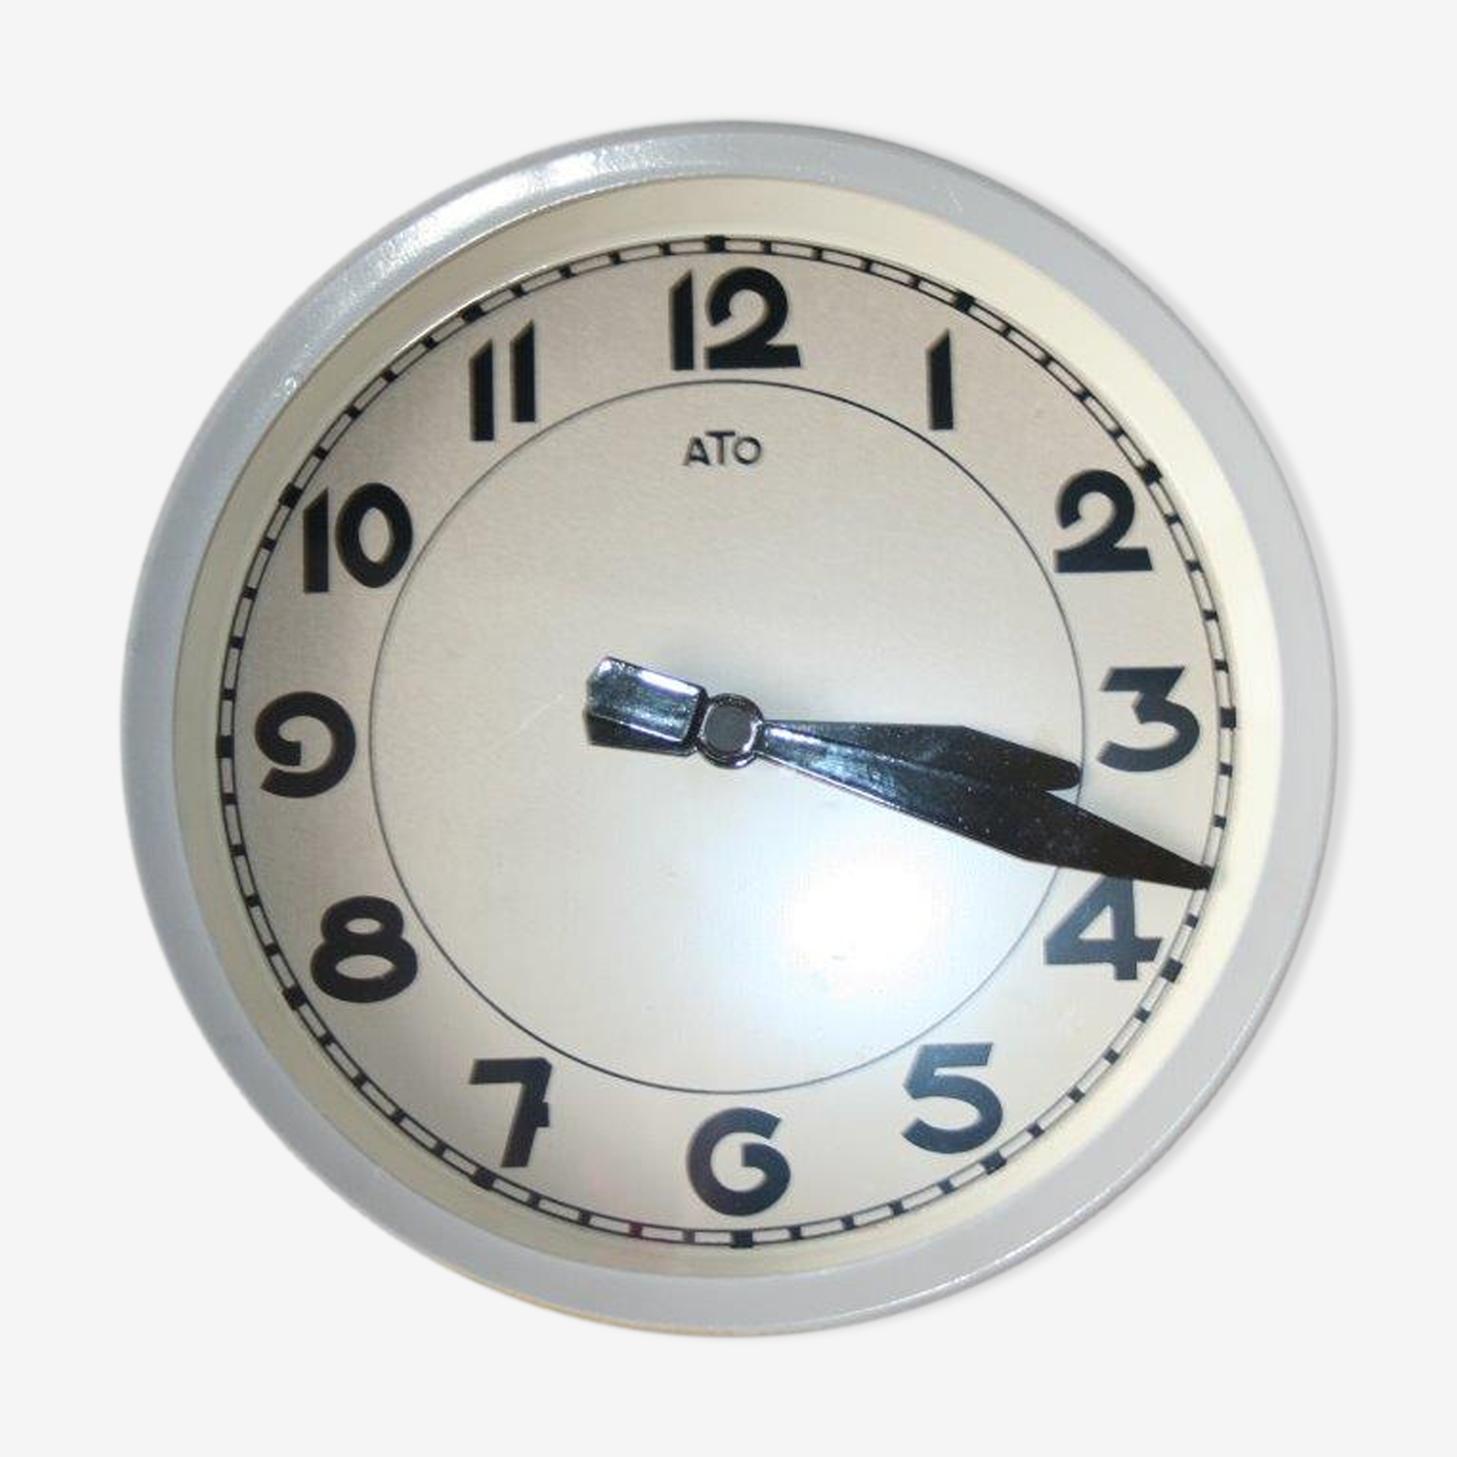 Horloge pendule Ato industrielle de gare